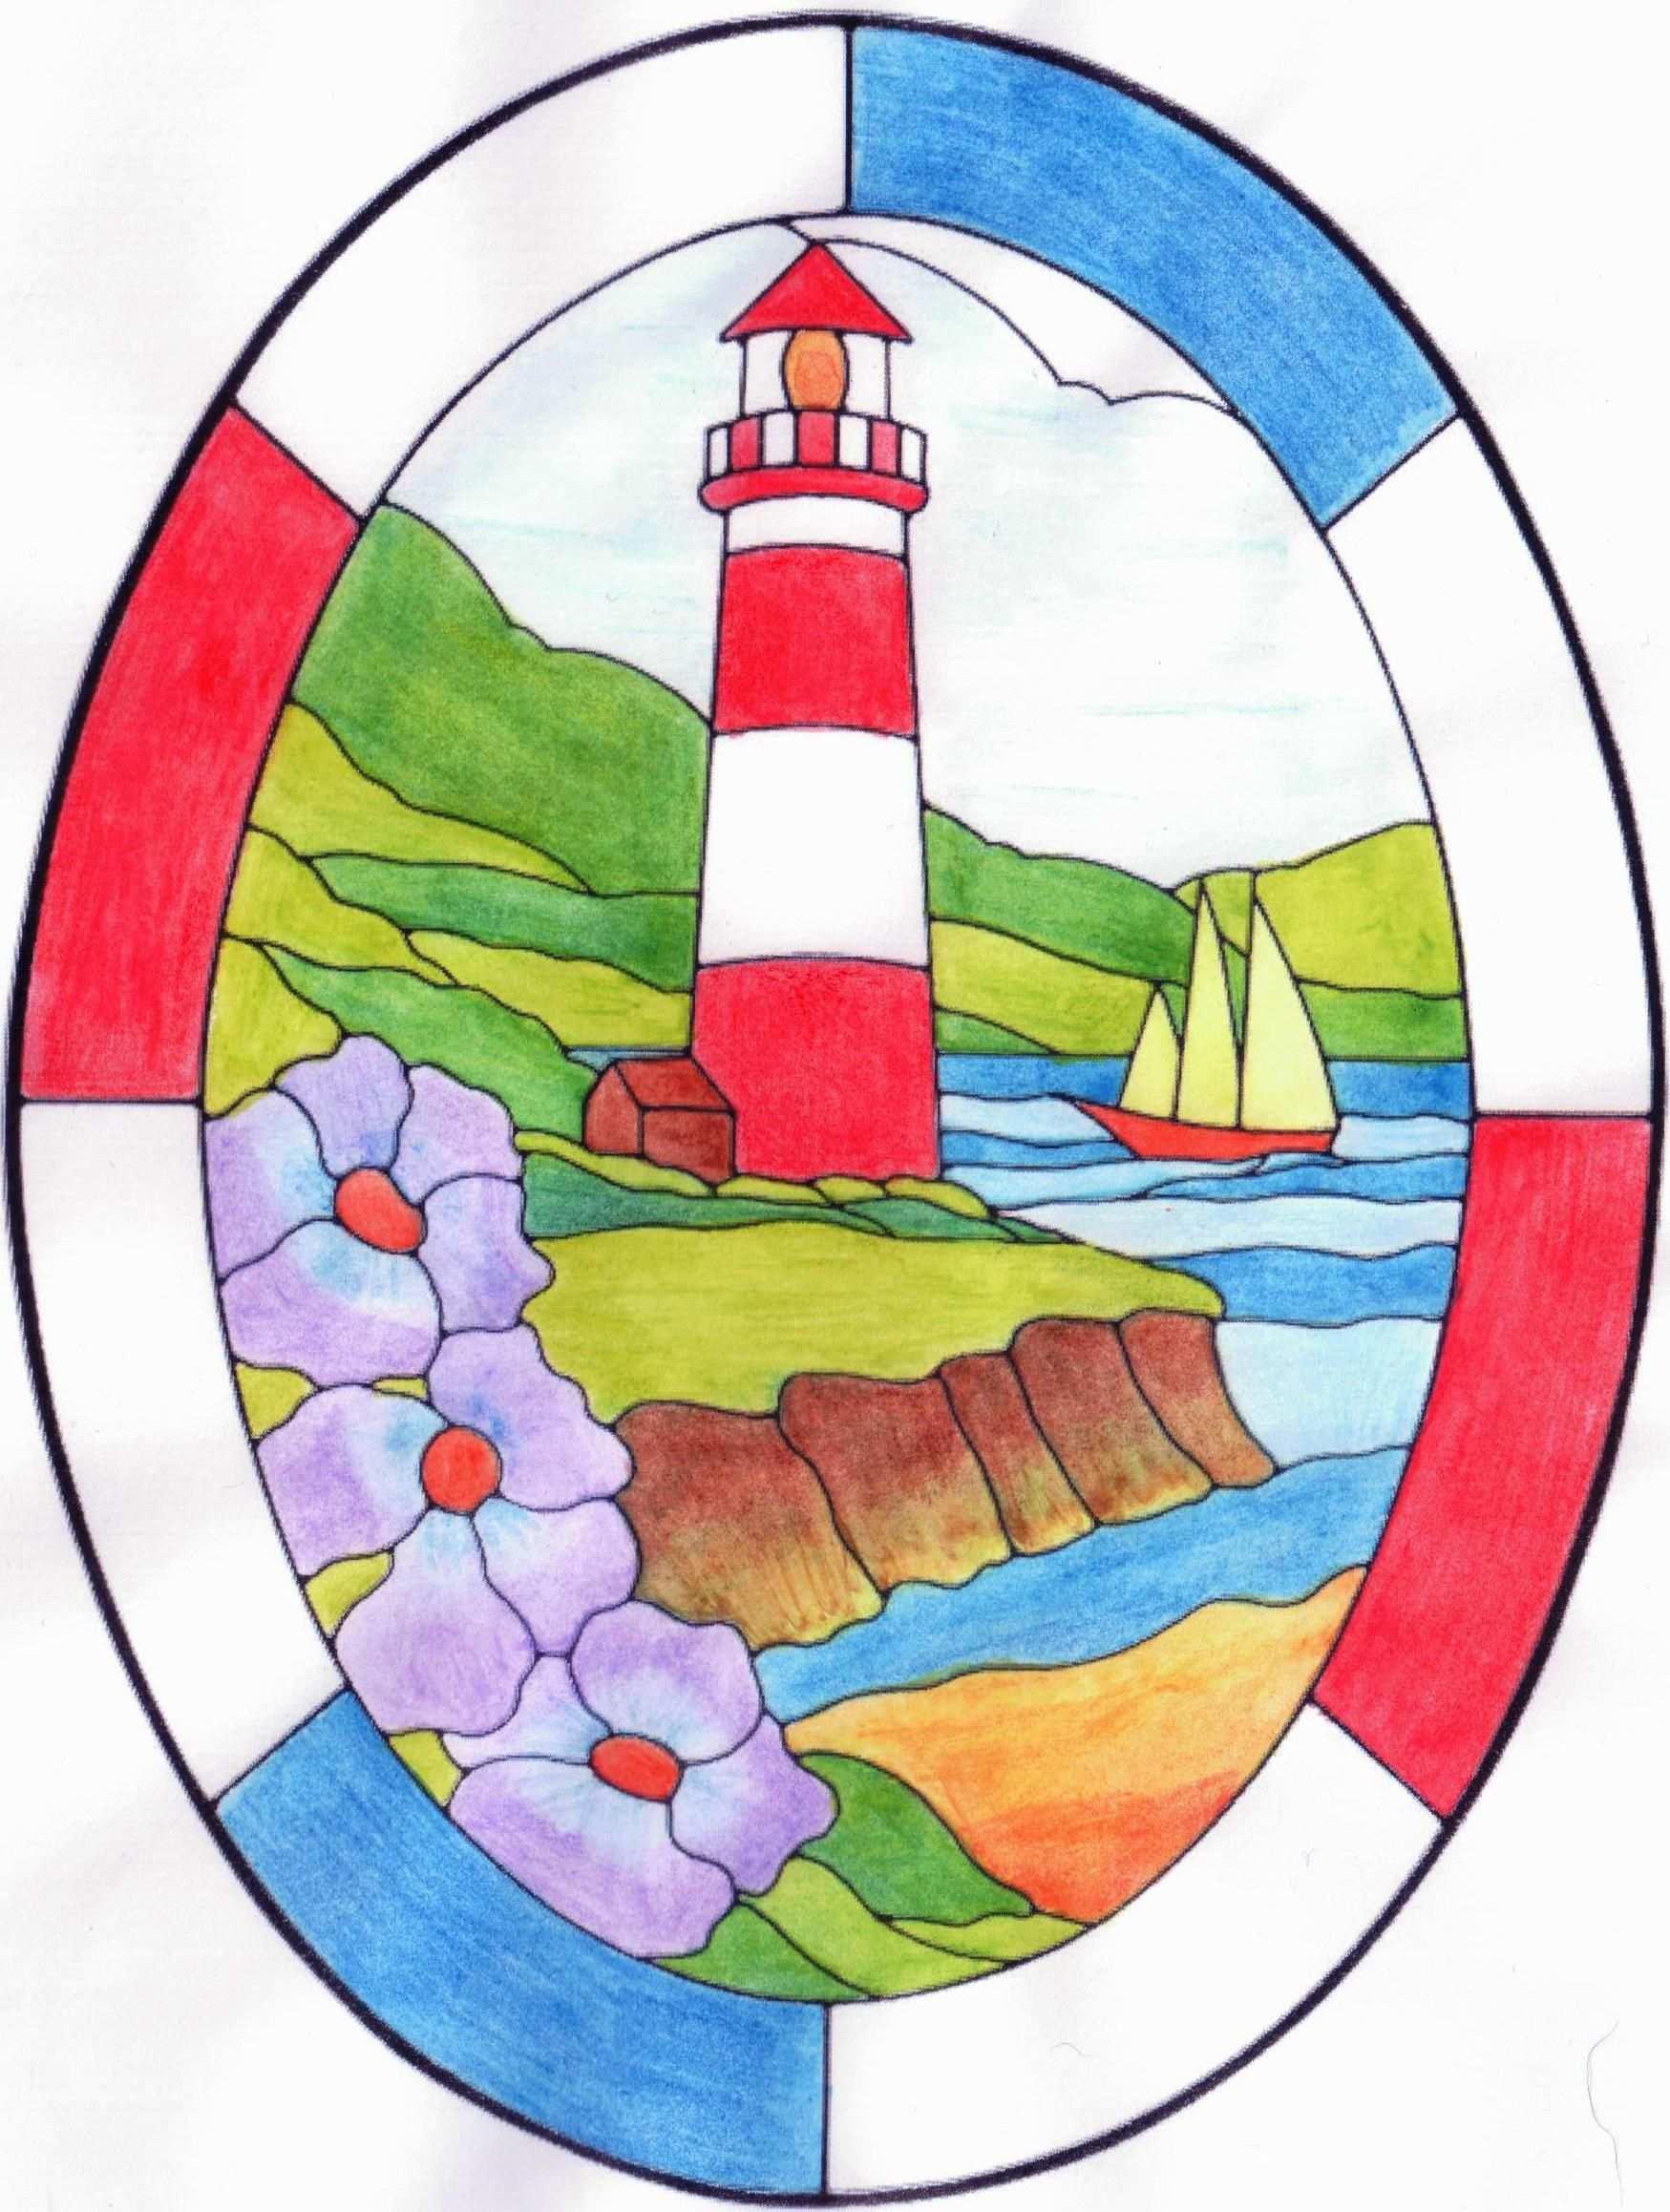 Vuurtoren Kleurplaat Colouring Page Lighthouse Met Aquarelpotlood Christmas Drawing Nautical Cards Coloring Pages